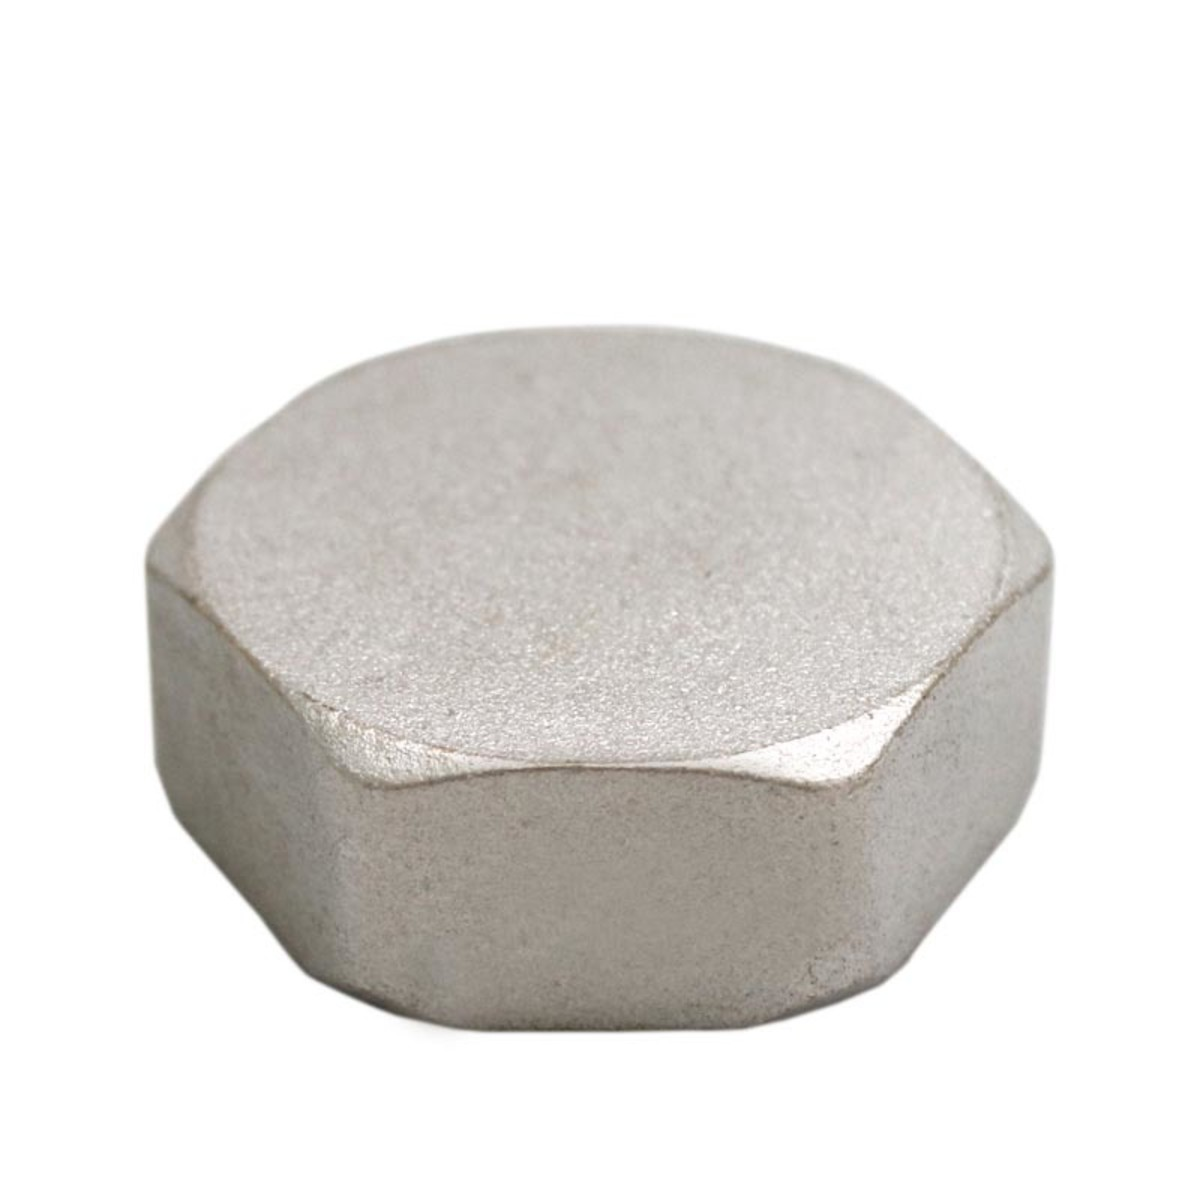 Заглушка внутренняя резьба 1/2 никелированная латунь